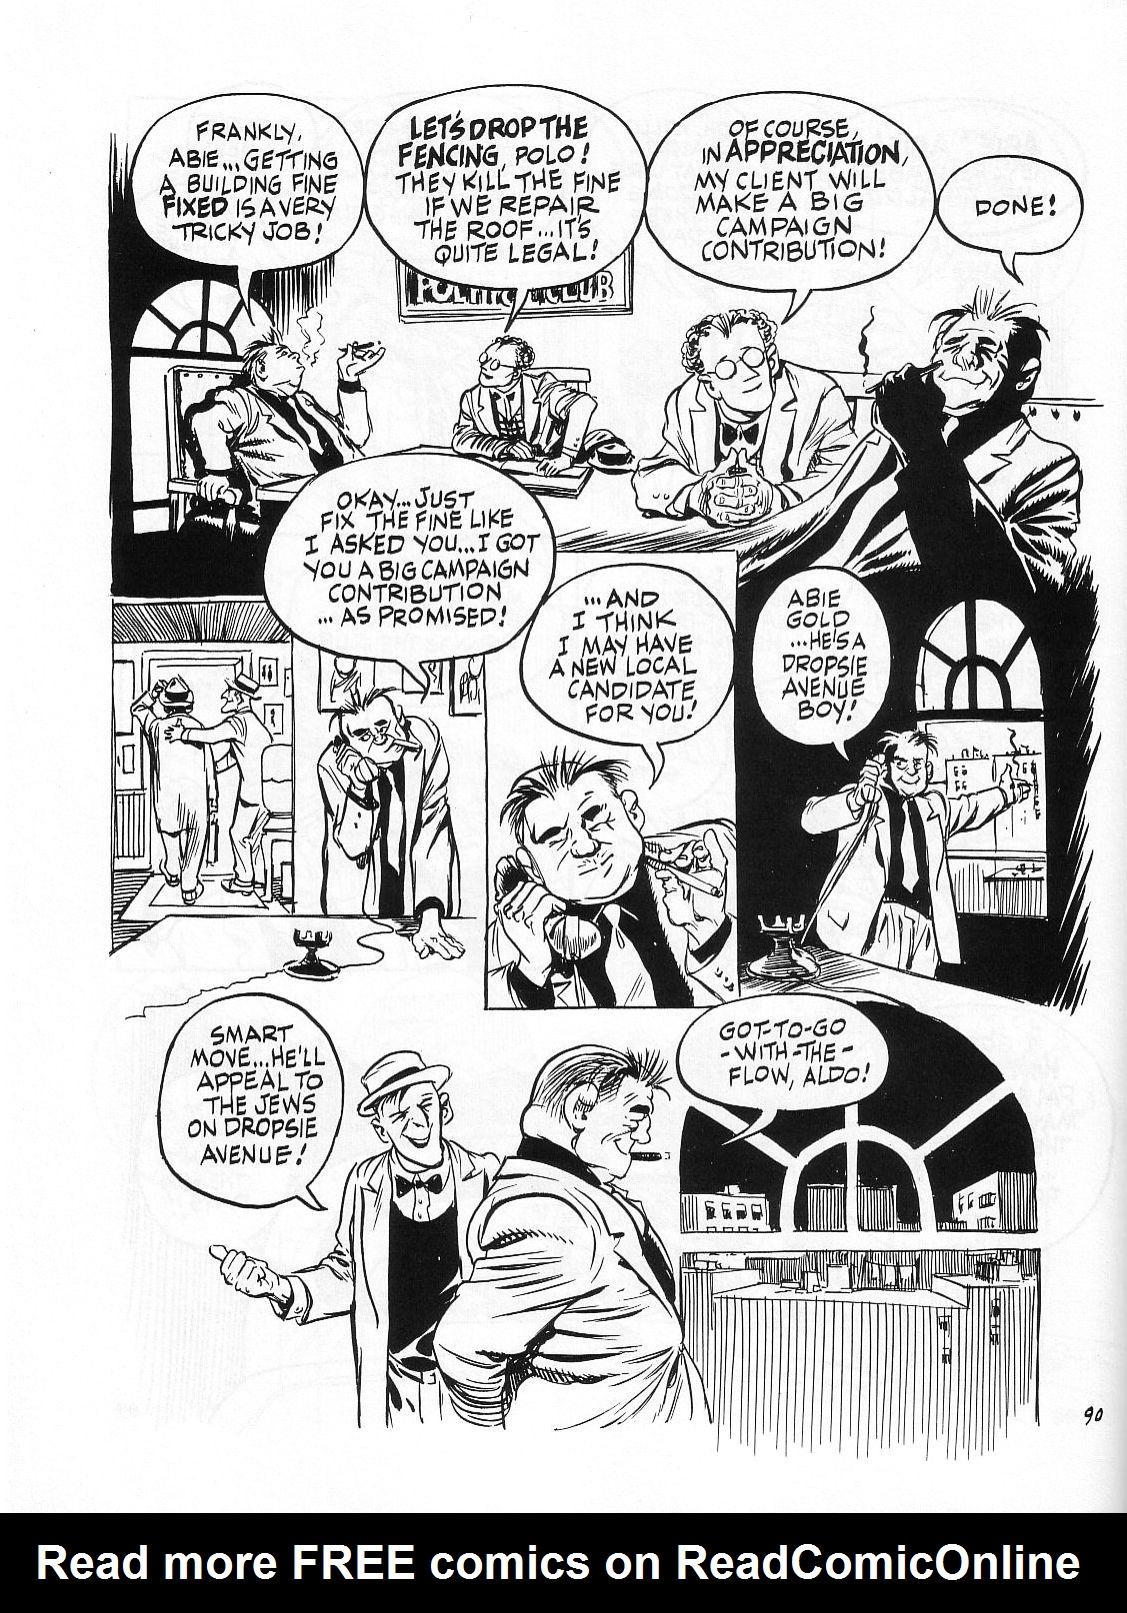 Read online Dropsie Avenue, The Neighborhood comic -  Issue # Full - 92